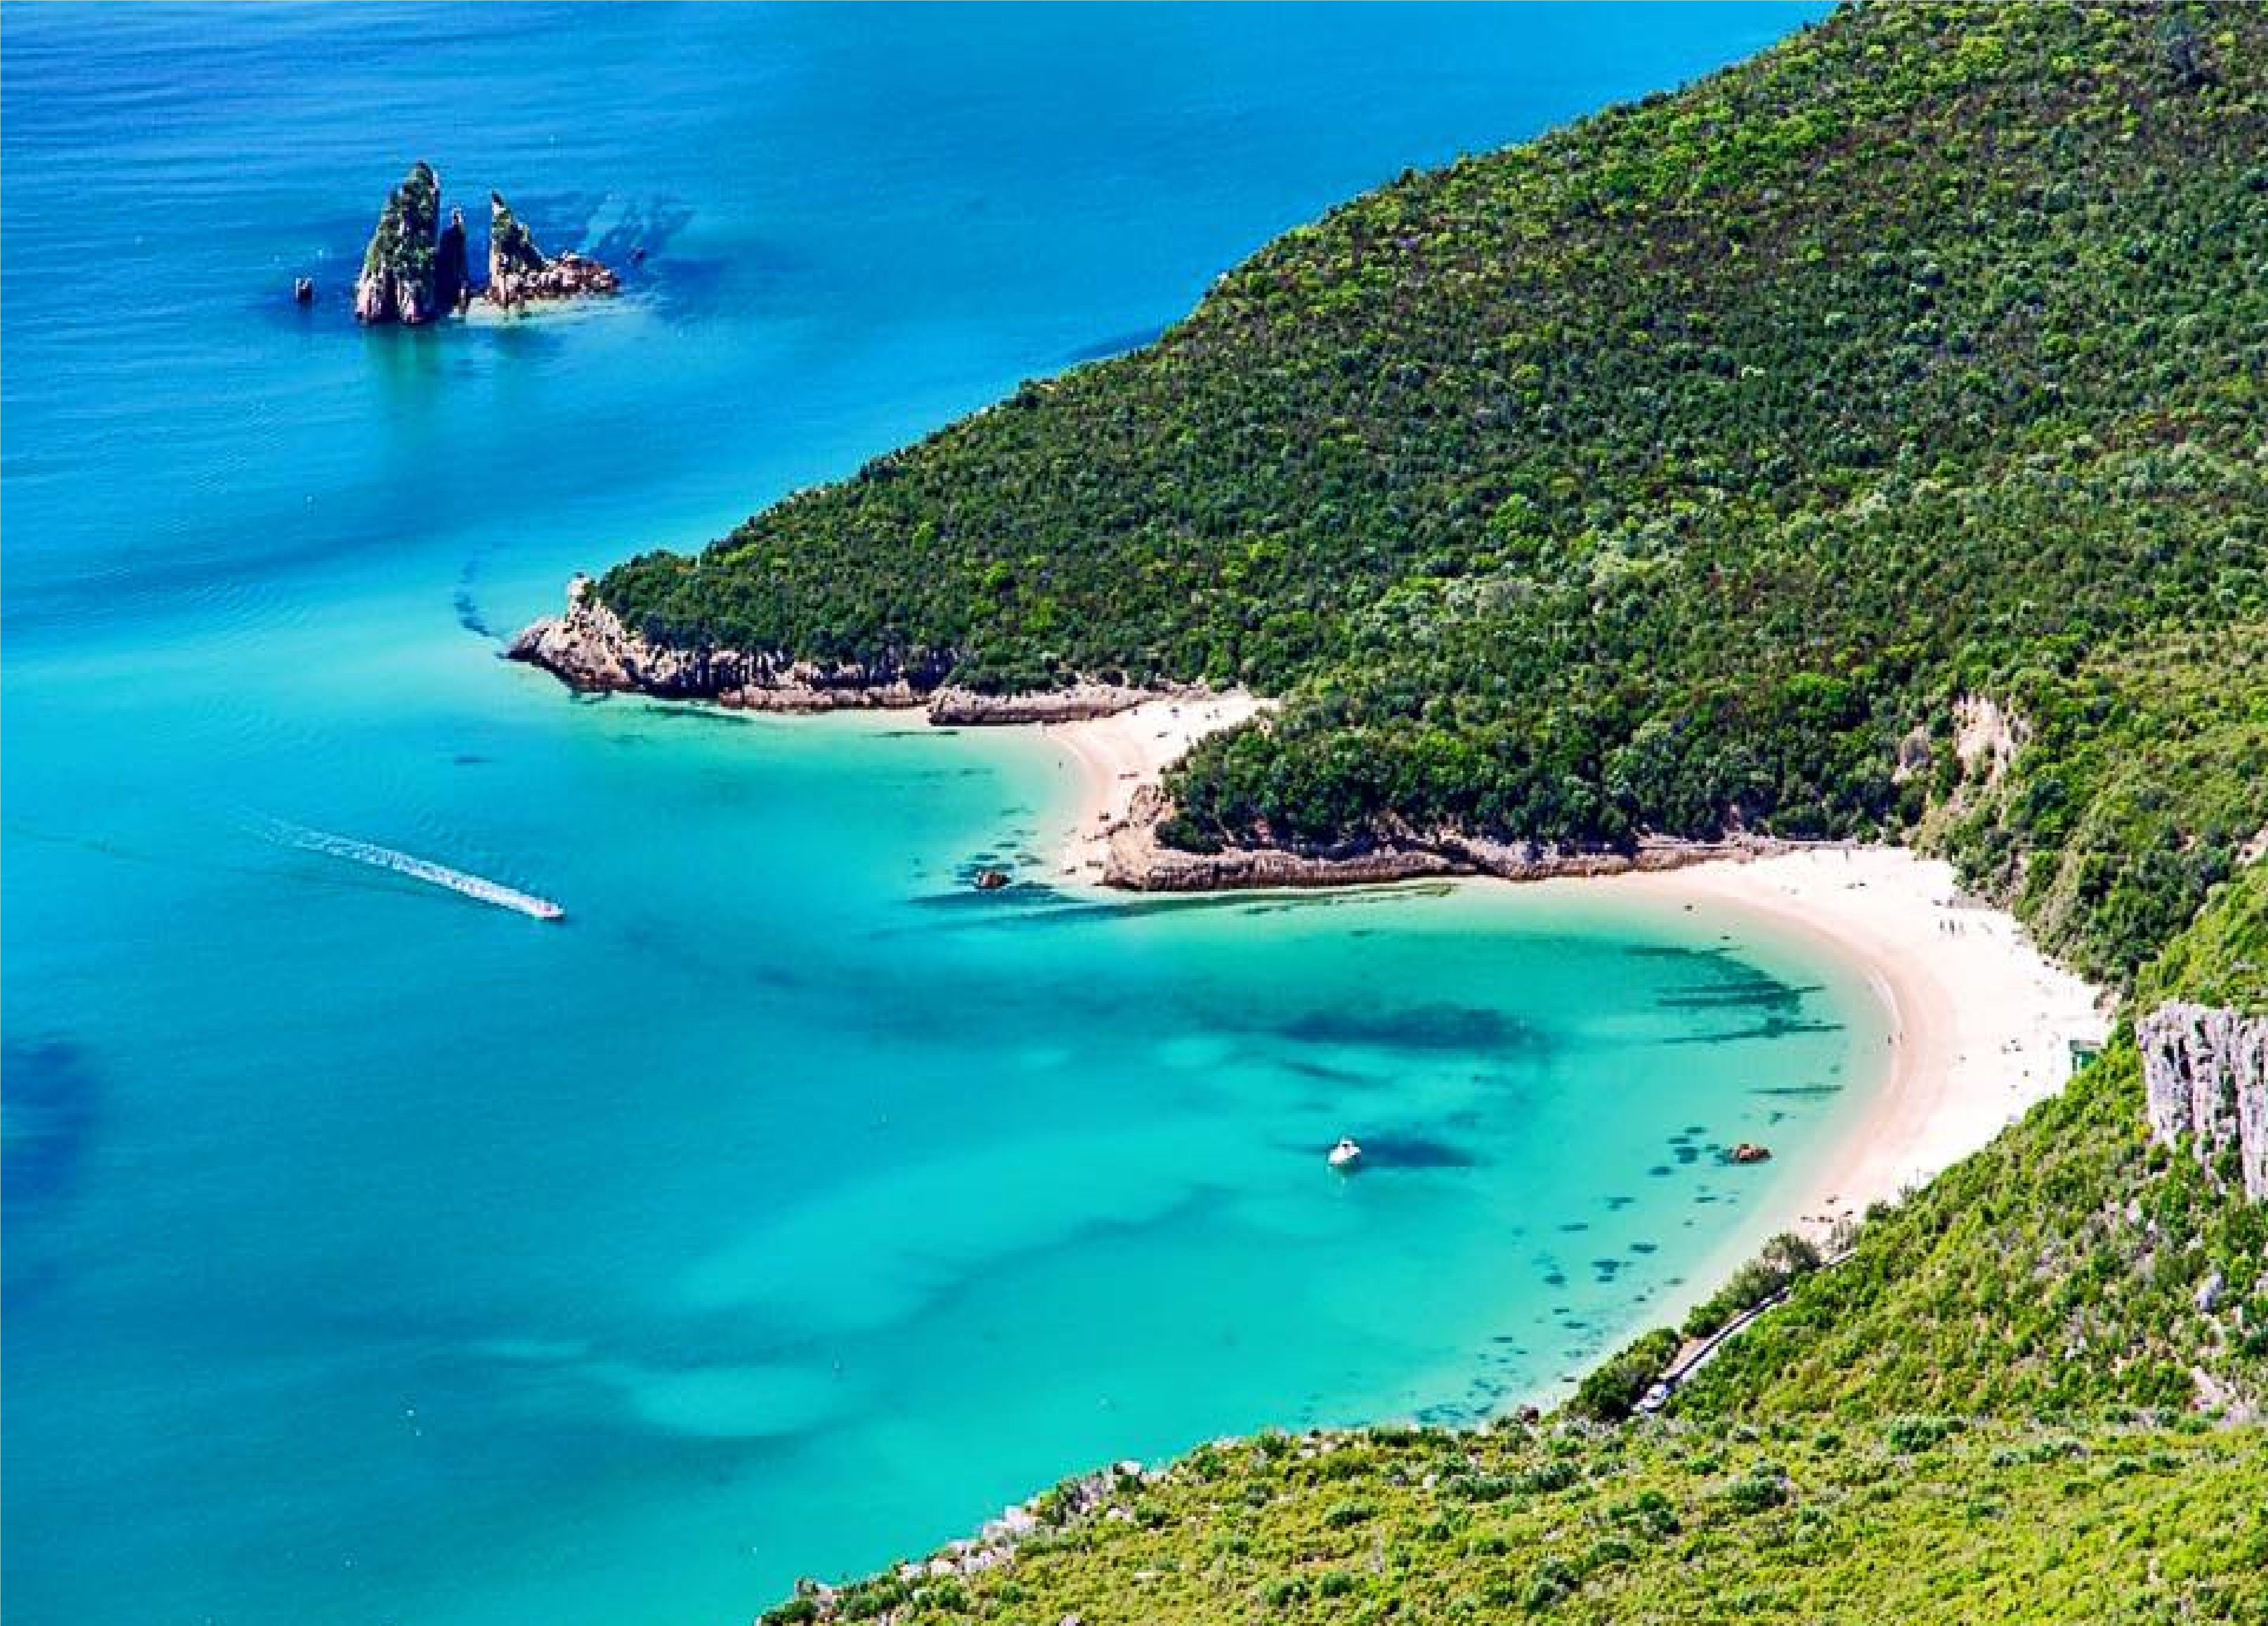 Praia de galapos set bal arr bida by praia de galapos - Natura portugal ...